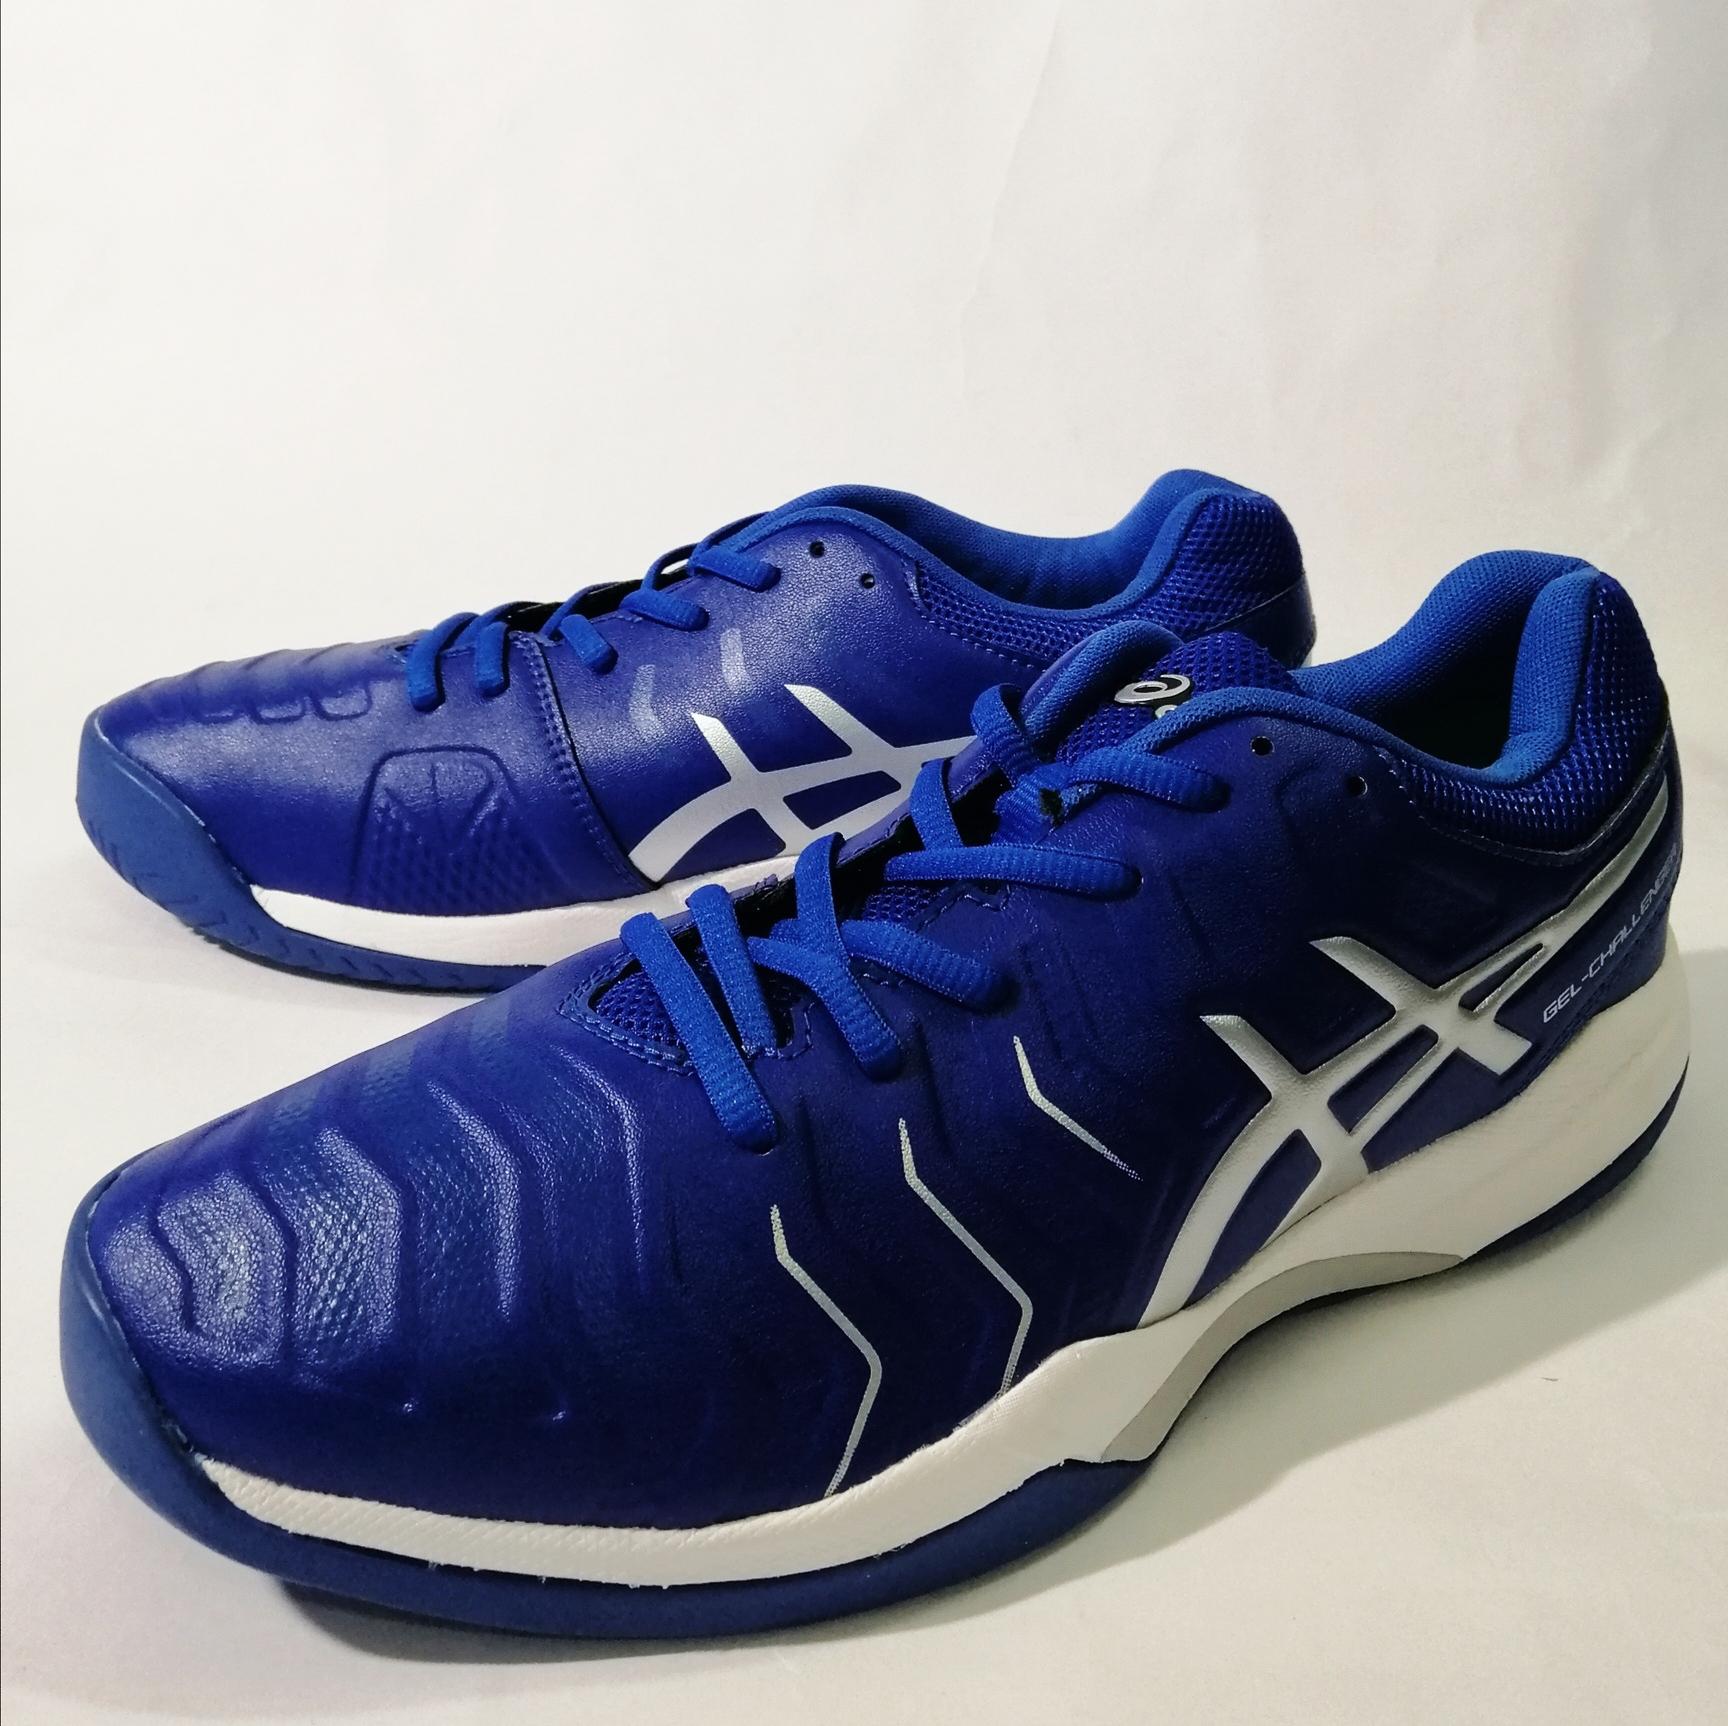 giày asics tennis nam